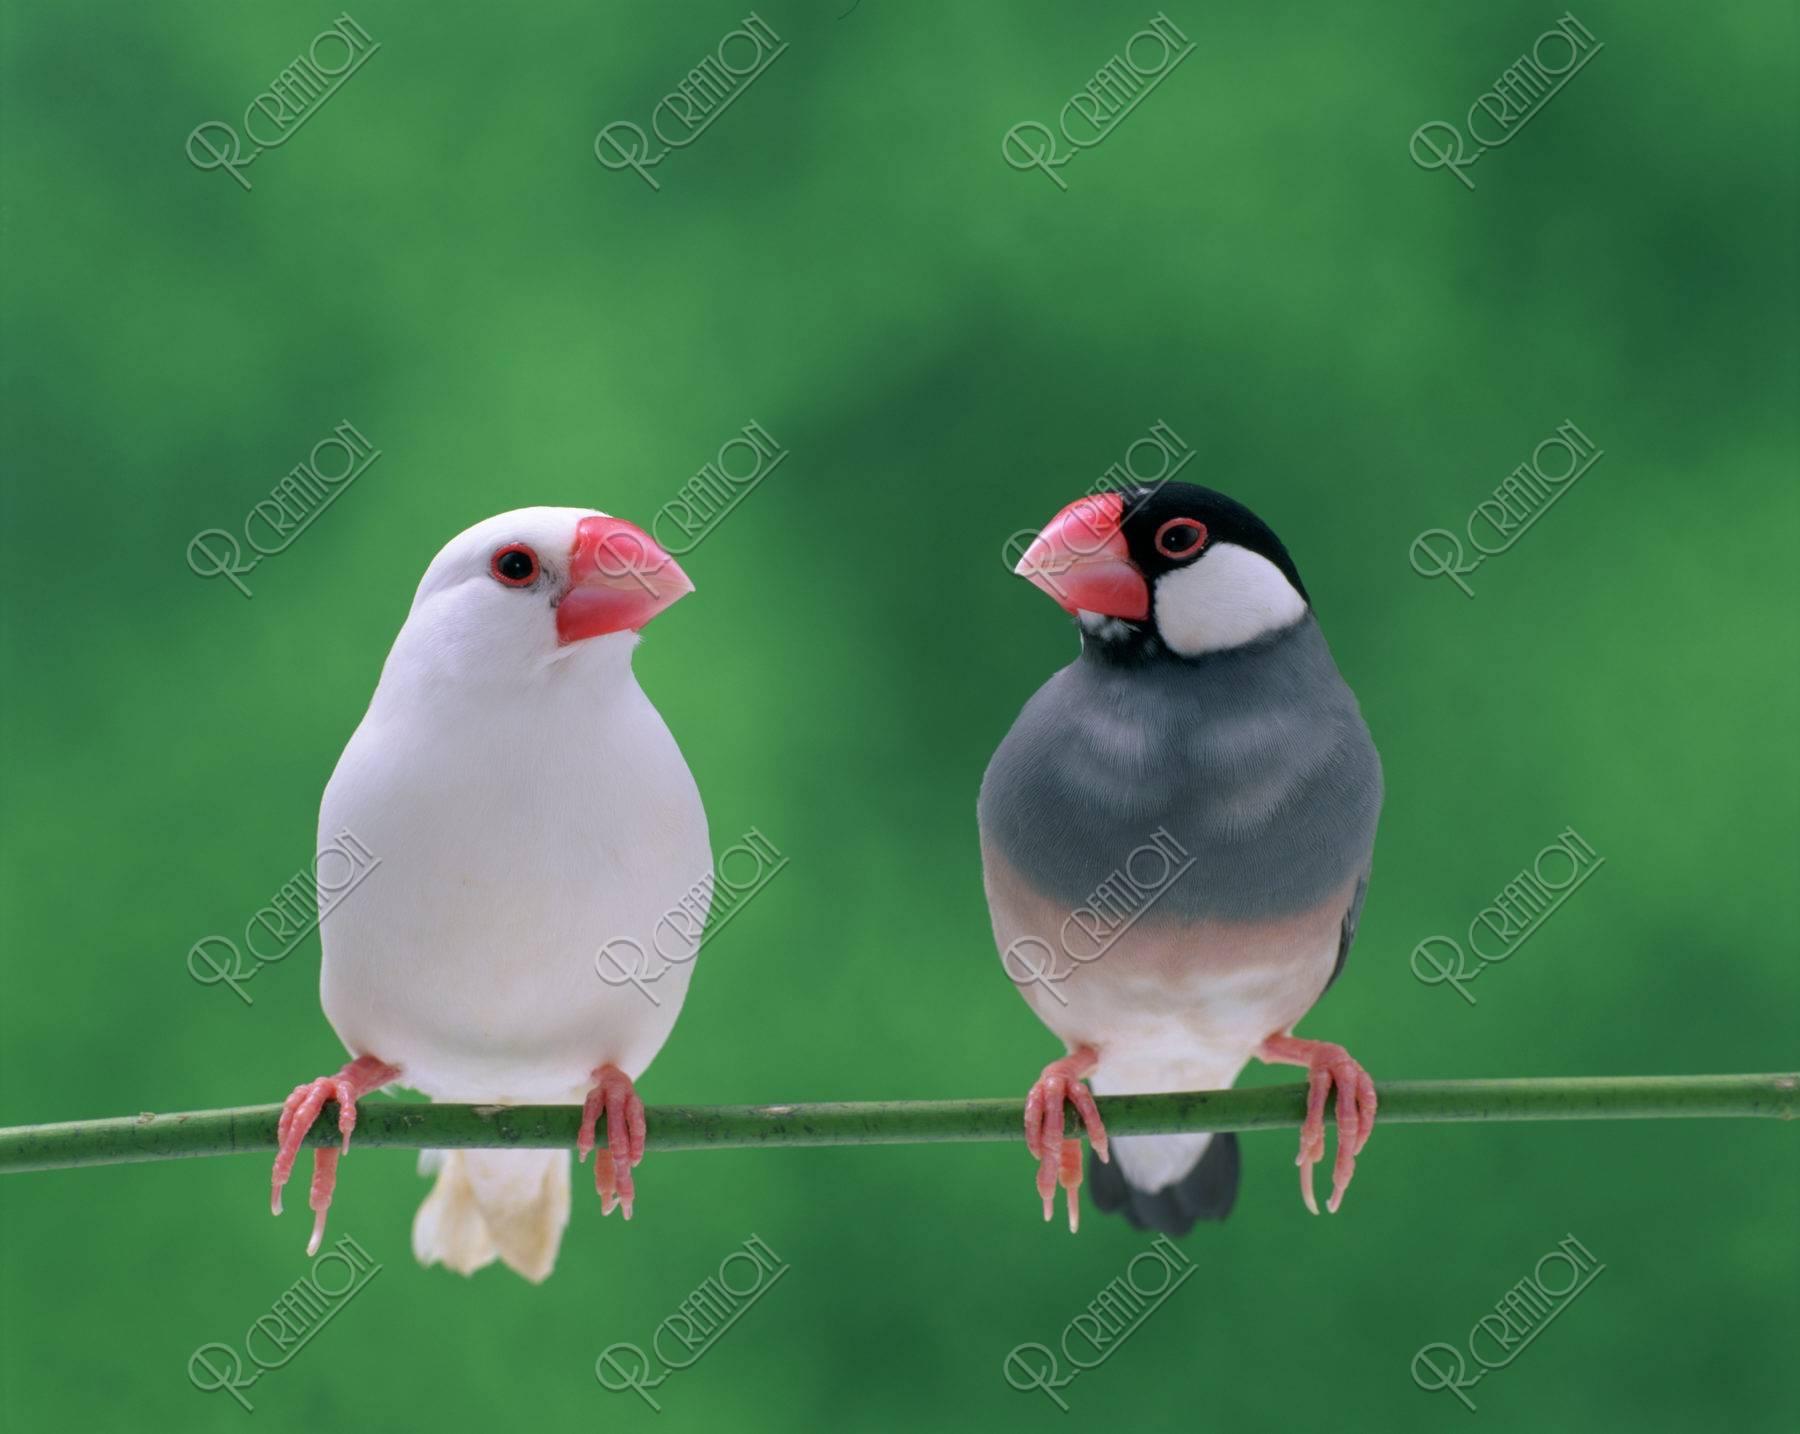 桜文鳥と白文鳥(二羽)